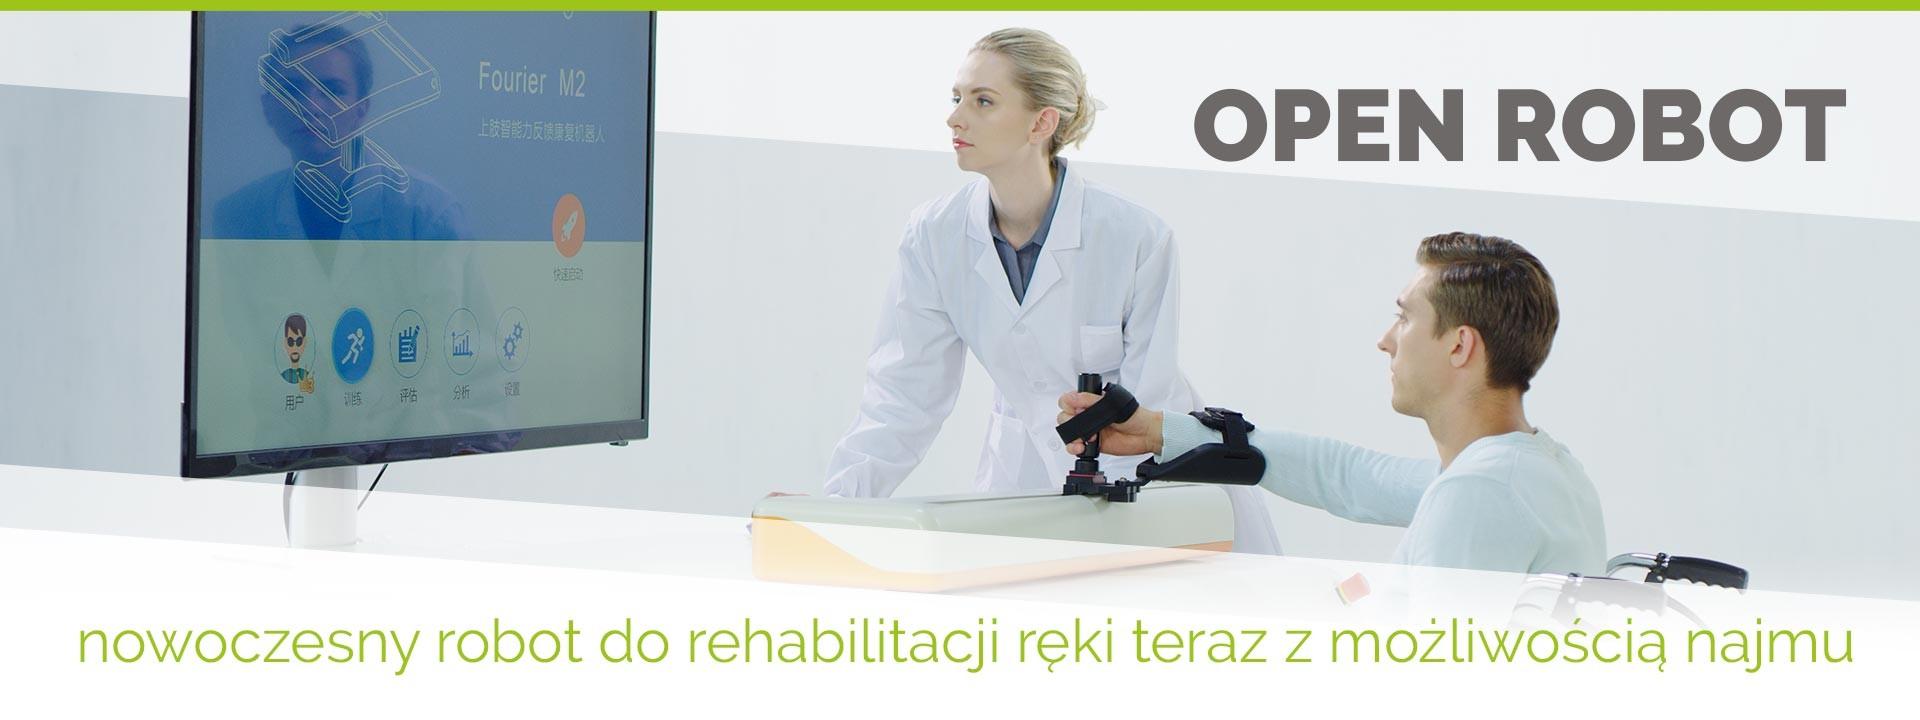 Projekt OPEN ROBOT - oferta najmu robota do rehabilitacji ręki